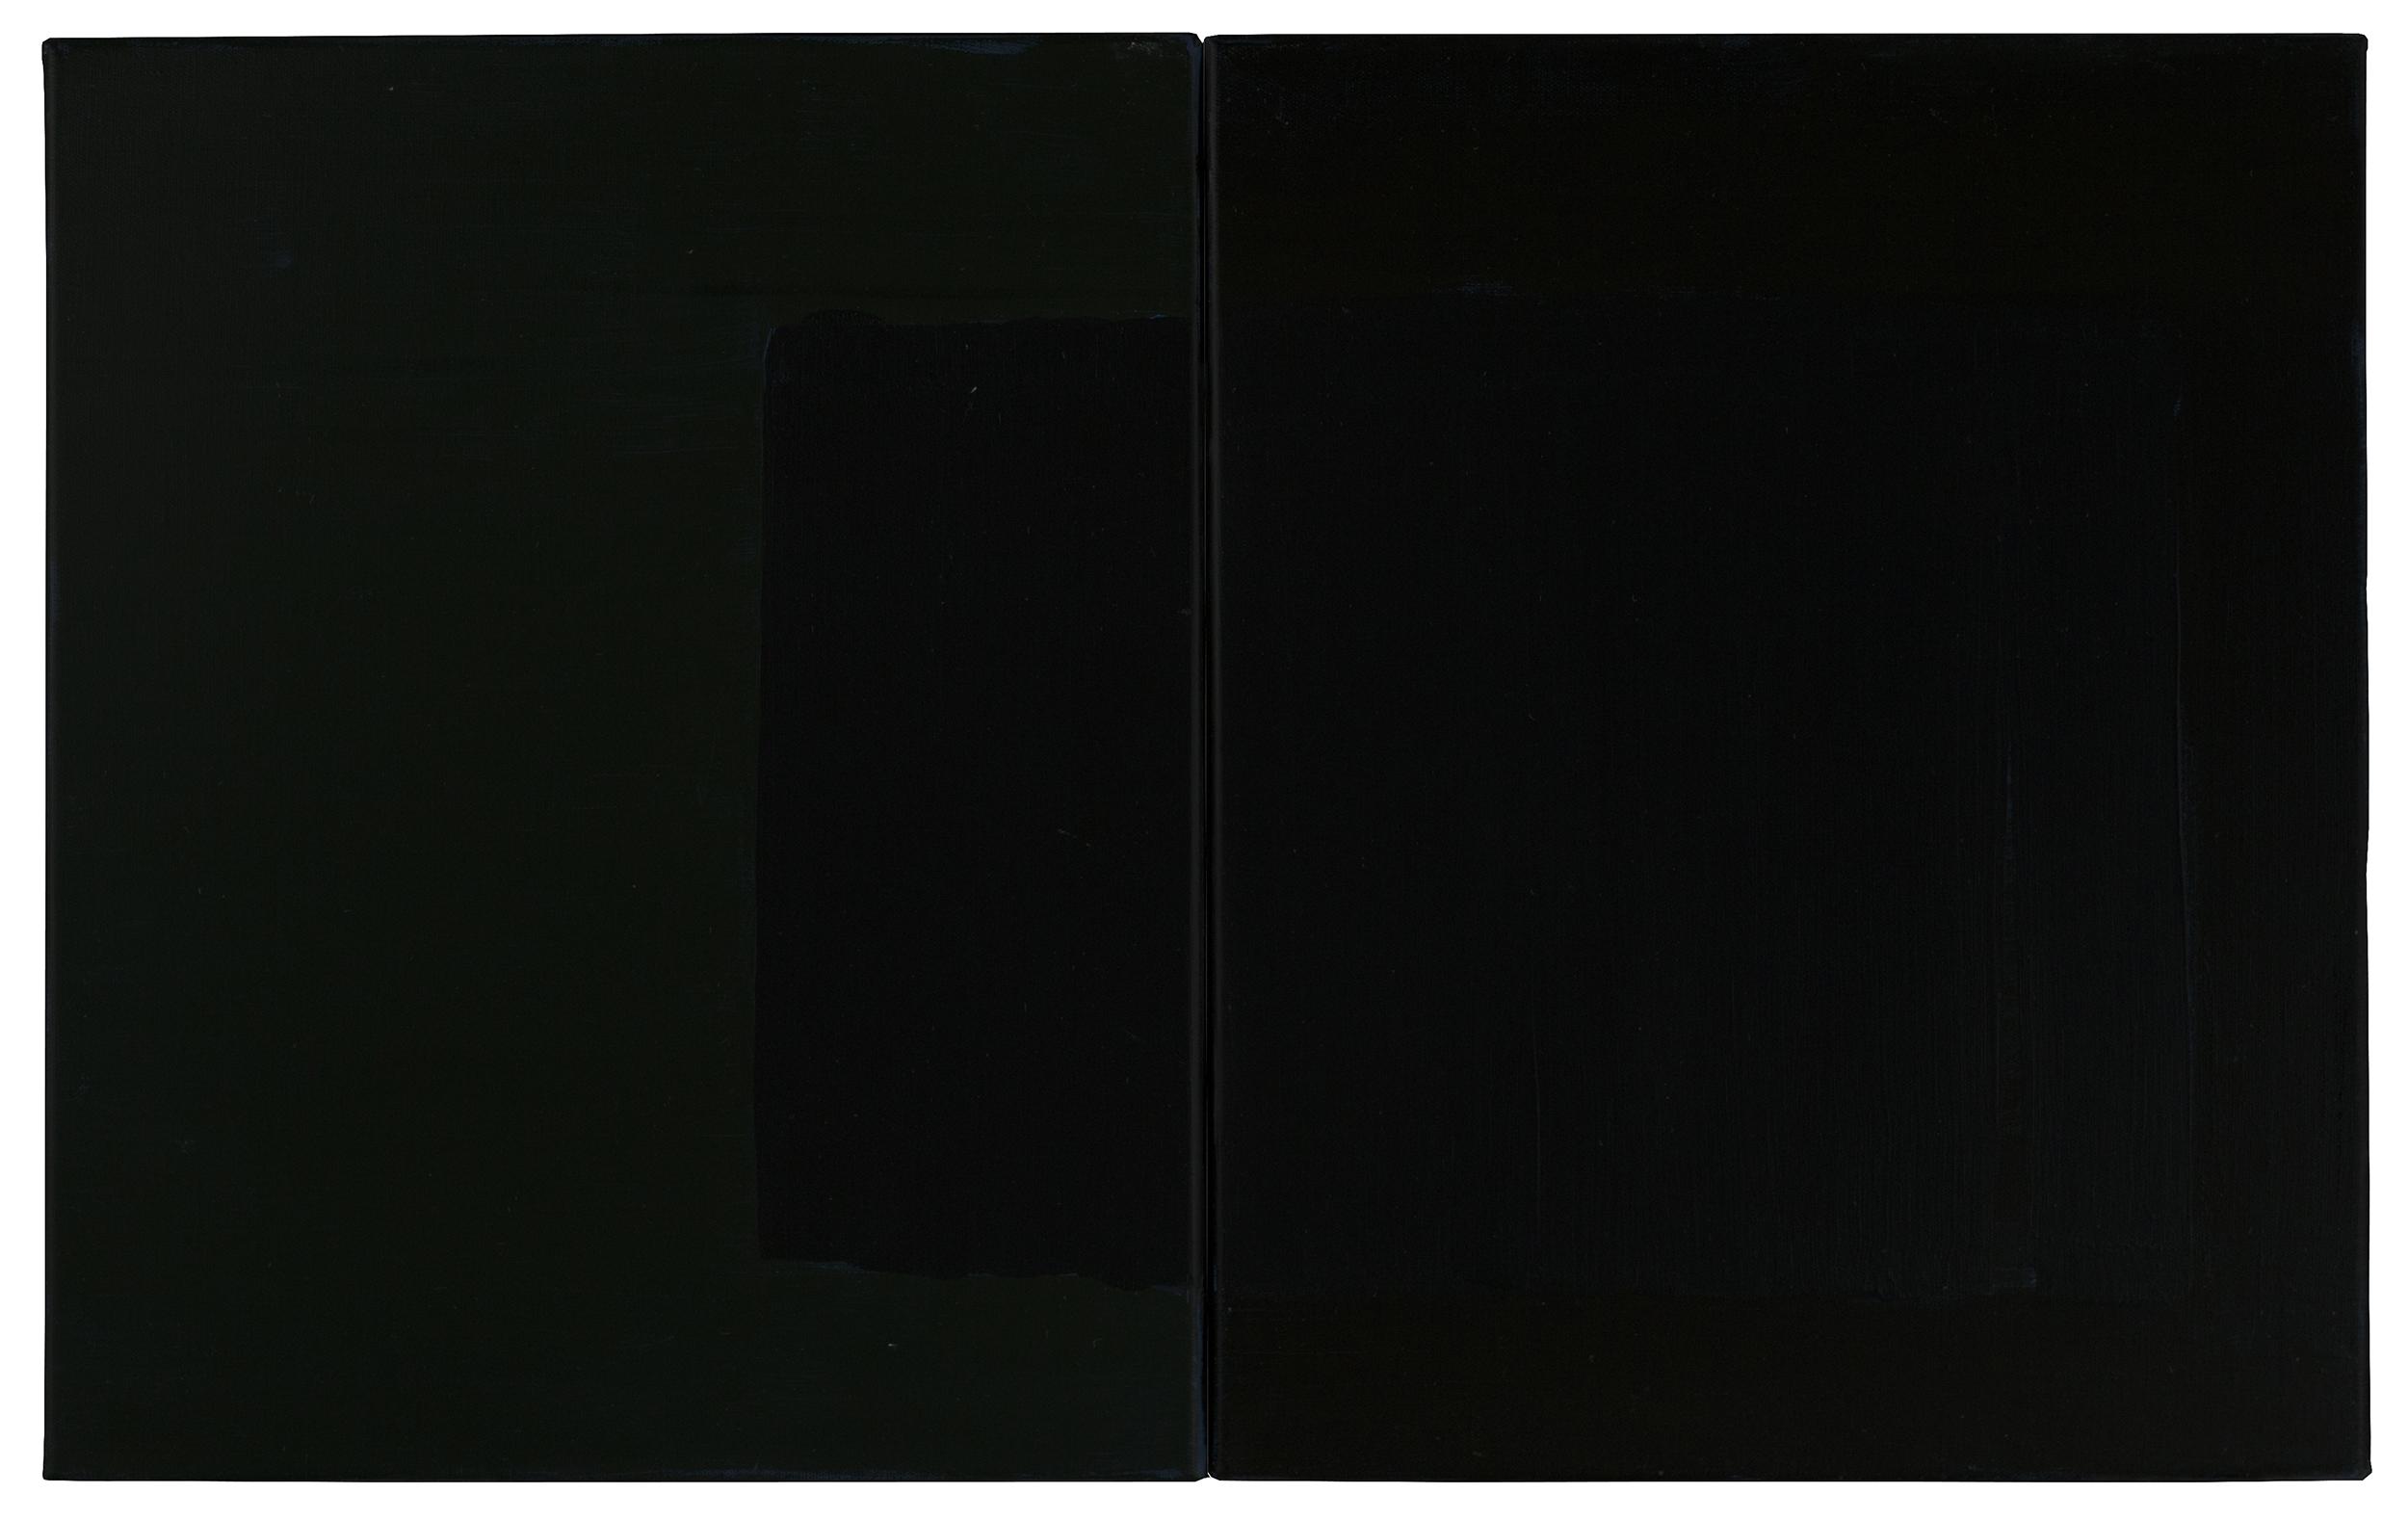 2018, 50x80cm, oil on canvas